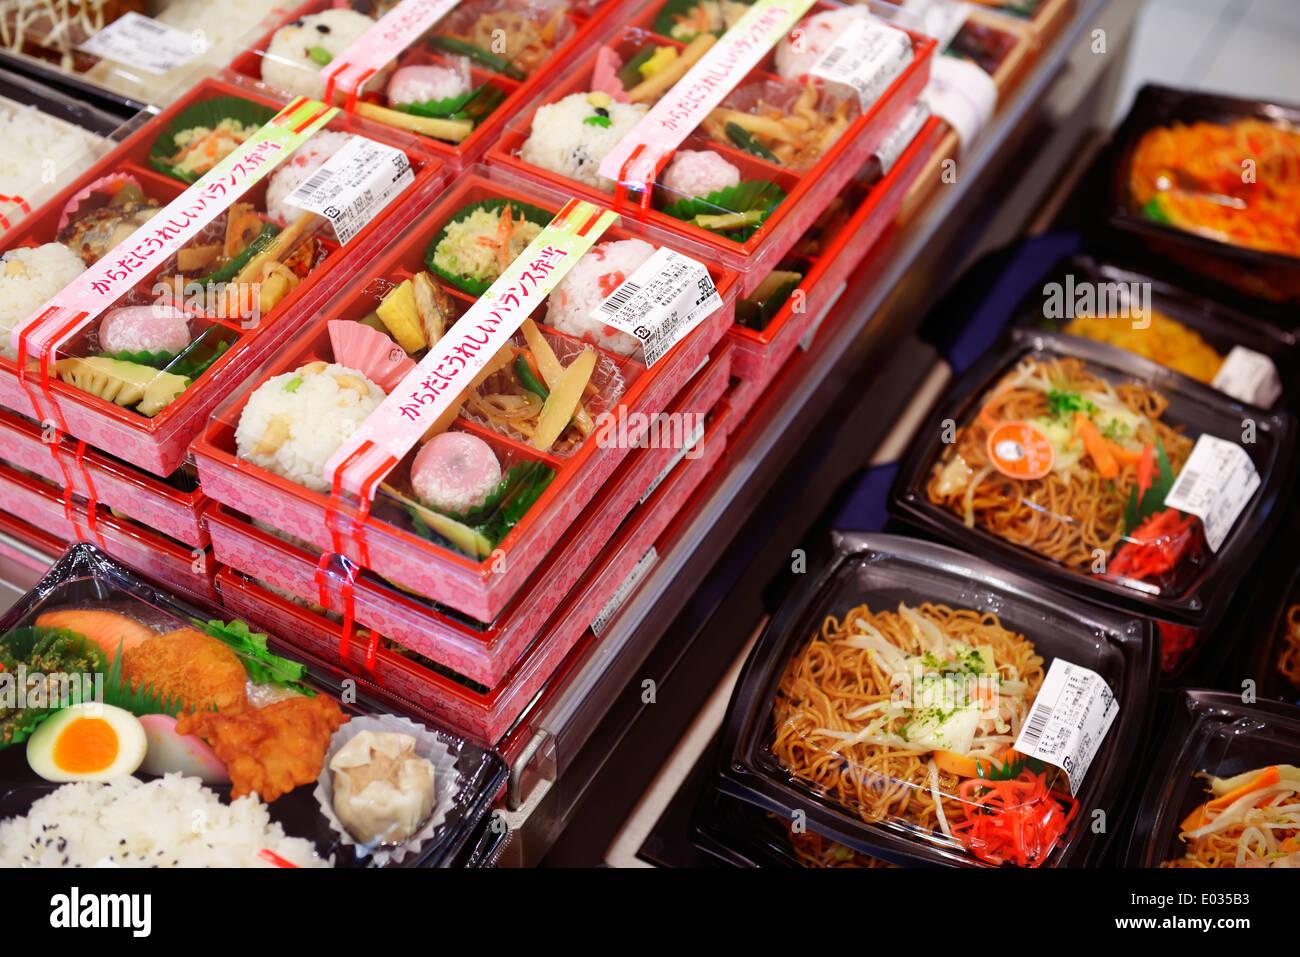 Packaged prepared food on display in a Japanese supermarket. Tokyo, Japan. - Stock Image